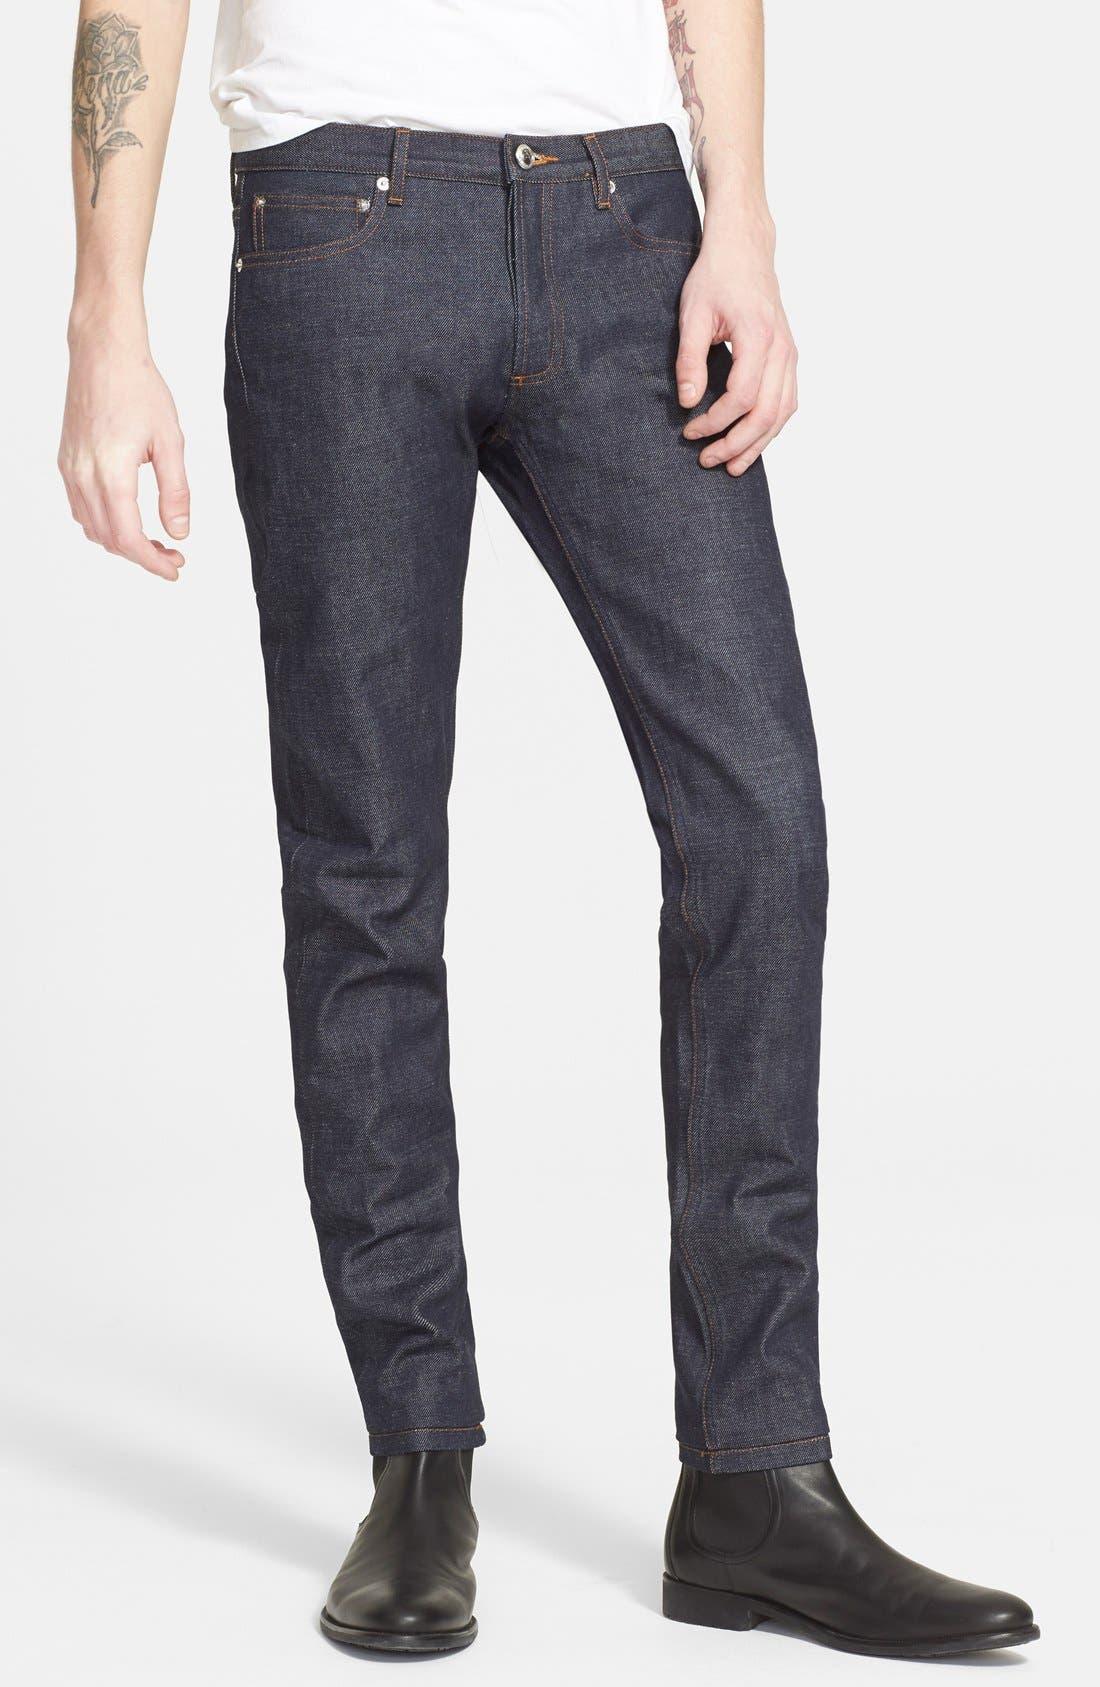 Petit Standard Slim Fit Raw Selvedge Jeans,                         Main,                         color, Indigo Wash